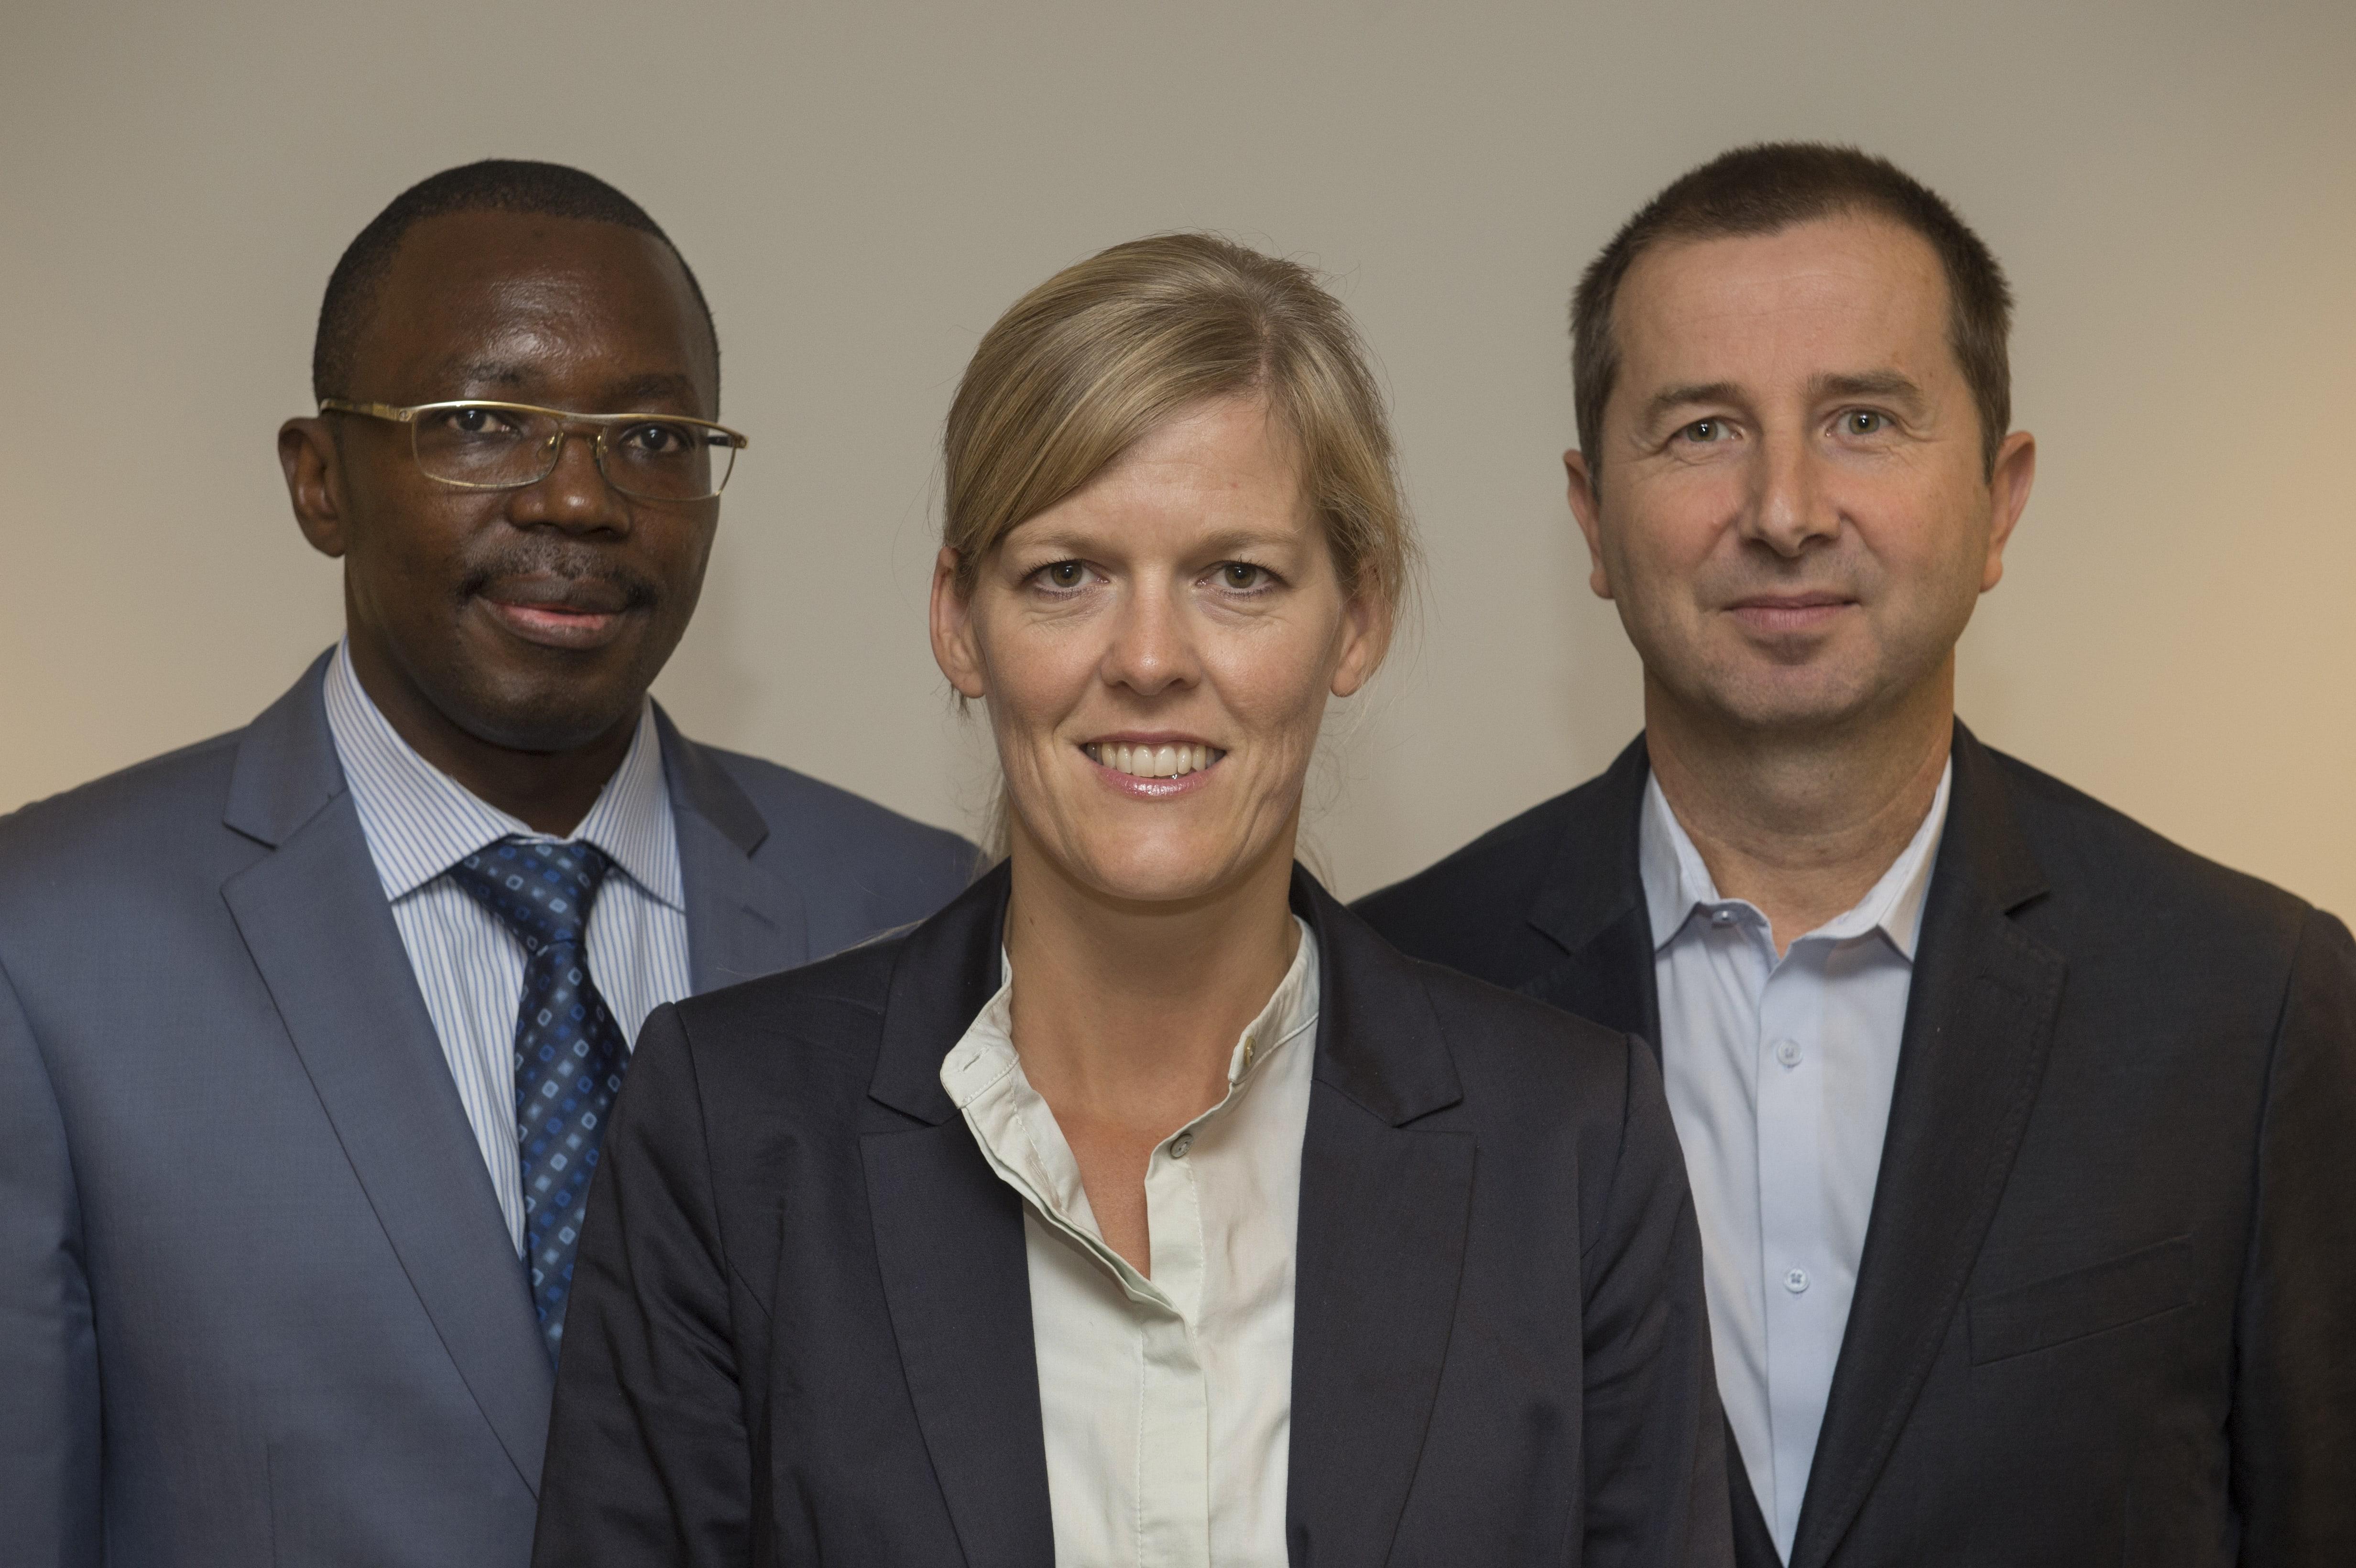 De gauche à droite: Frédéric KALALA, Claudia HUBER, Pierre DAUBERT